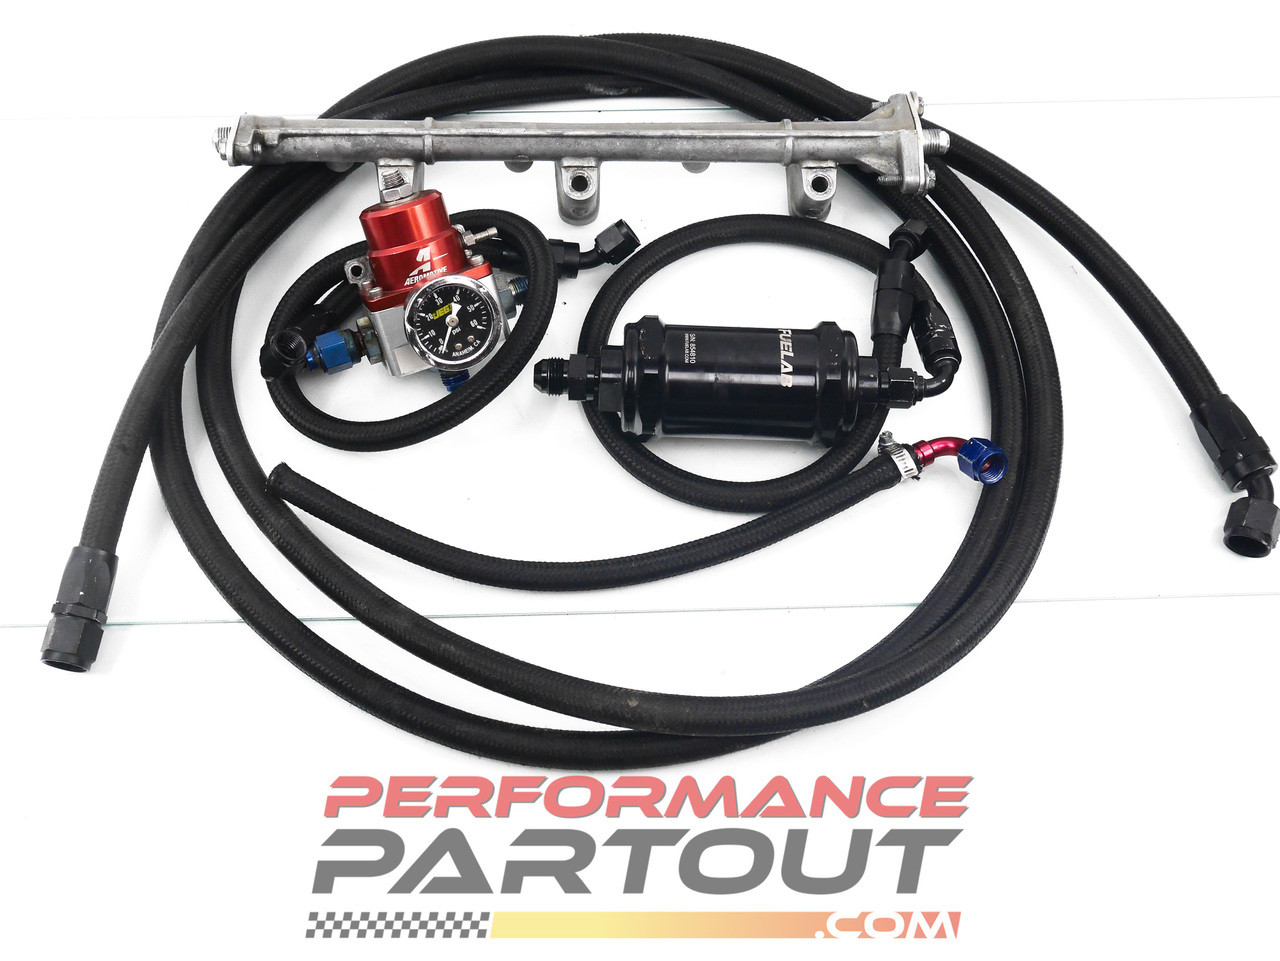 Terrific Fuel System Aeromotive Fuelab 1G Dsm Performance Partout Wiring Digital Resources Bletukbiperorg